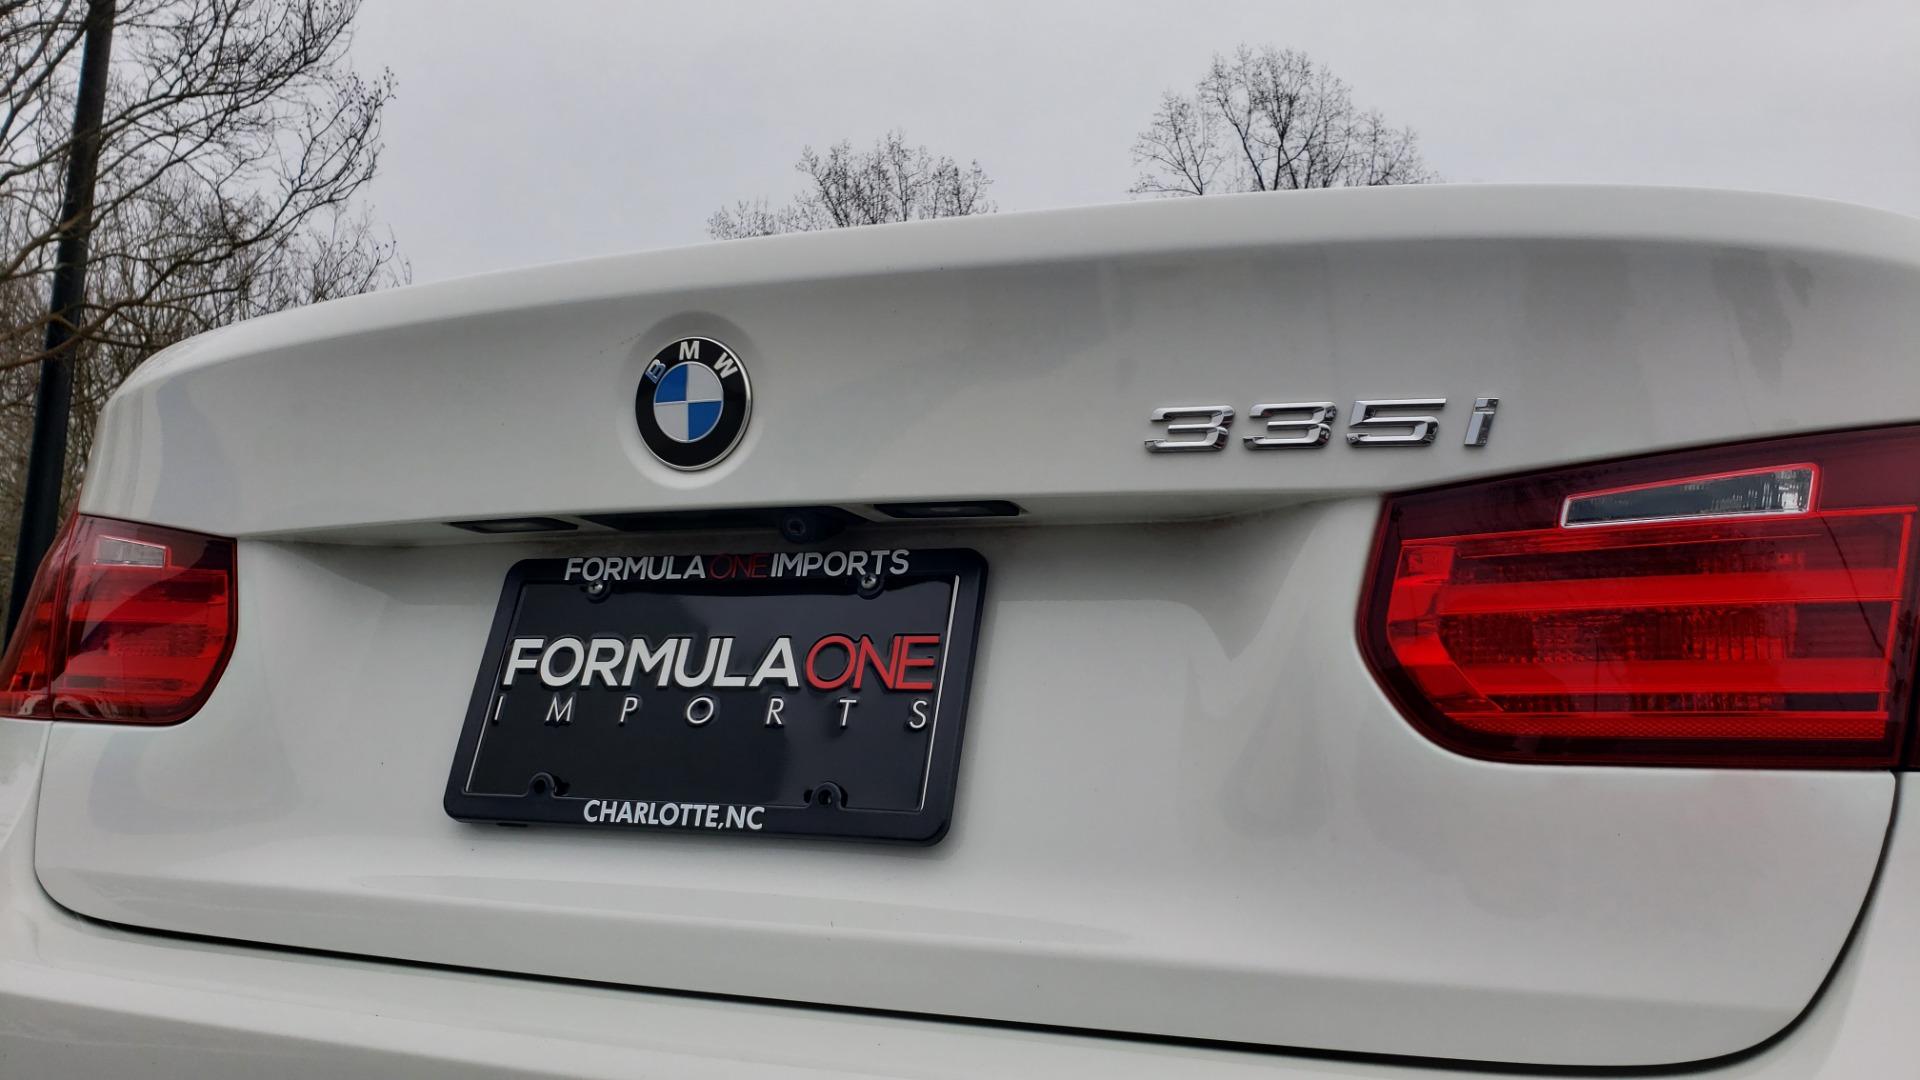 Used 2015 BMW 3 Series 335I M-SPORT / PREM PKG / HK SND / SUNROOF / REARVIEW for sale Sold at Formula Imports in Charlotte NC 28227 31